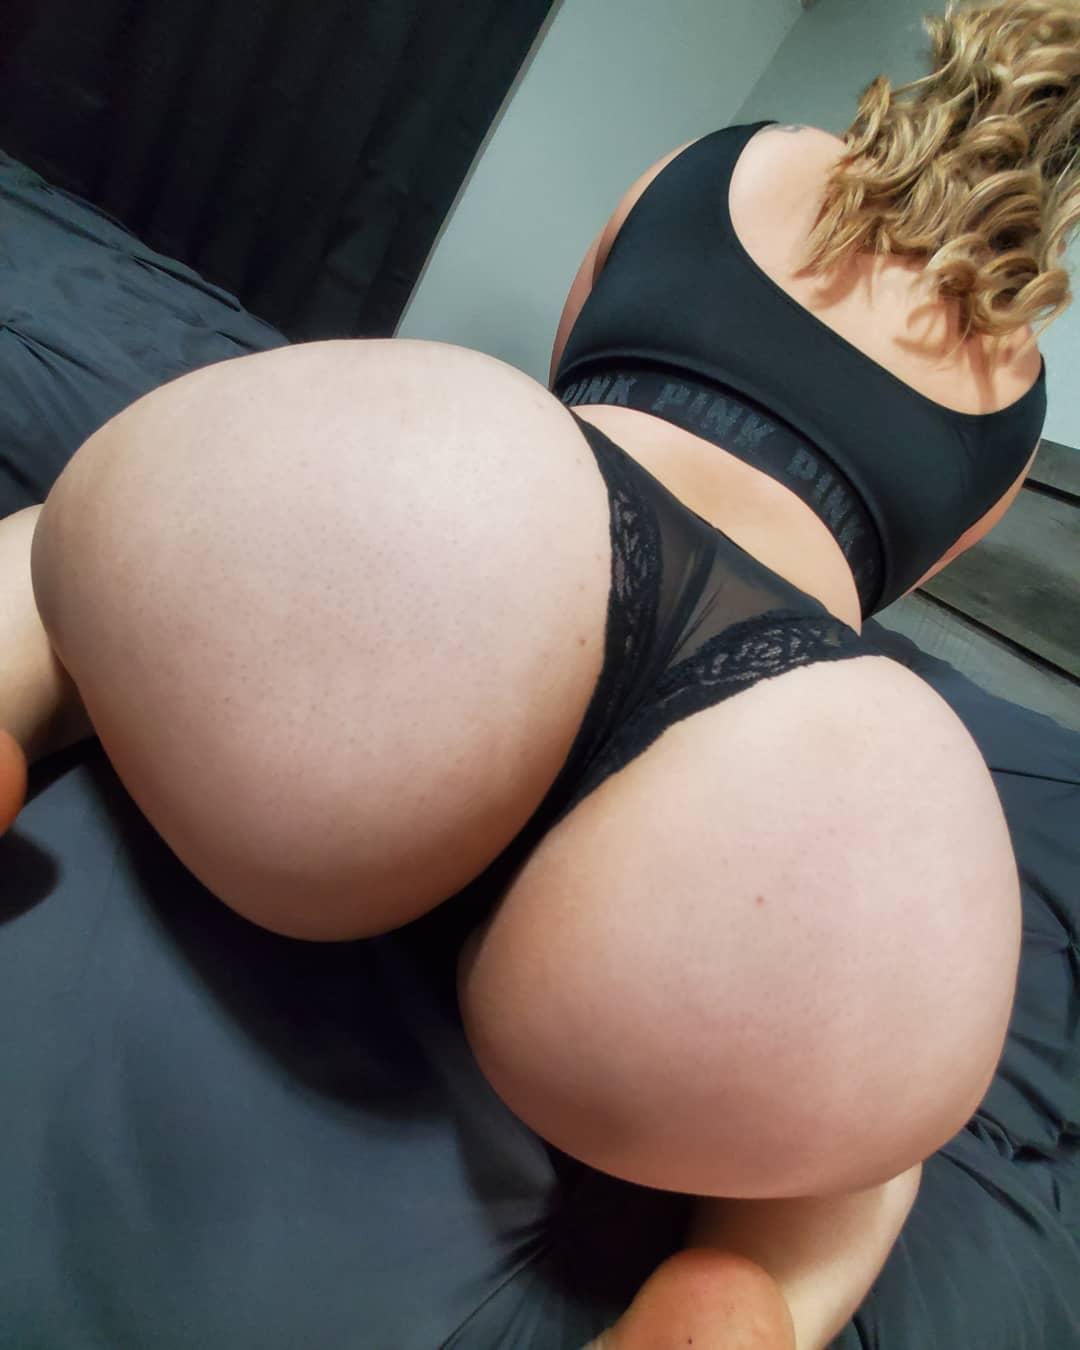 Boricuabootyy Nude & Sex Tape Onlyfans Leaked! 0019